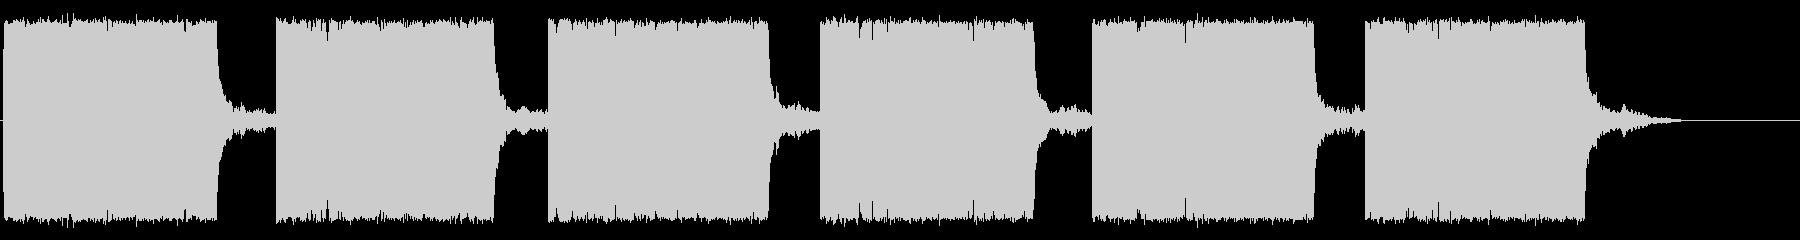 KANT近未来映画アニメ的アラーム音1の未再生の波形